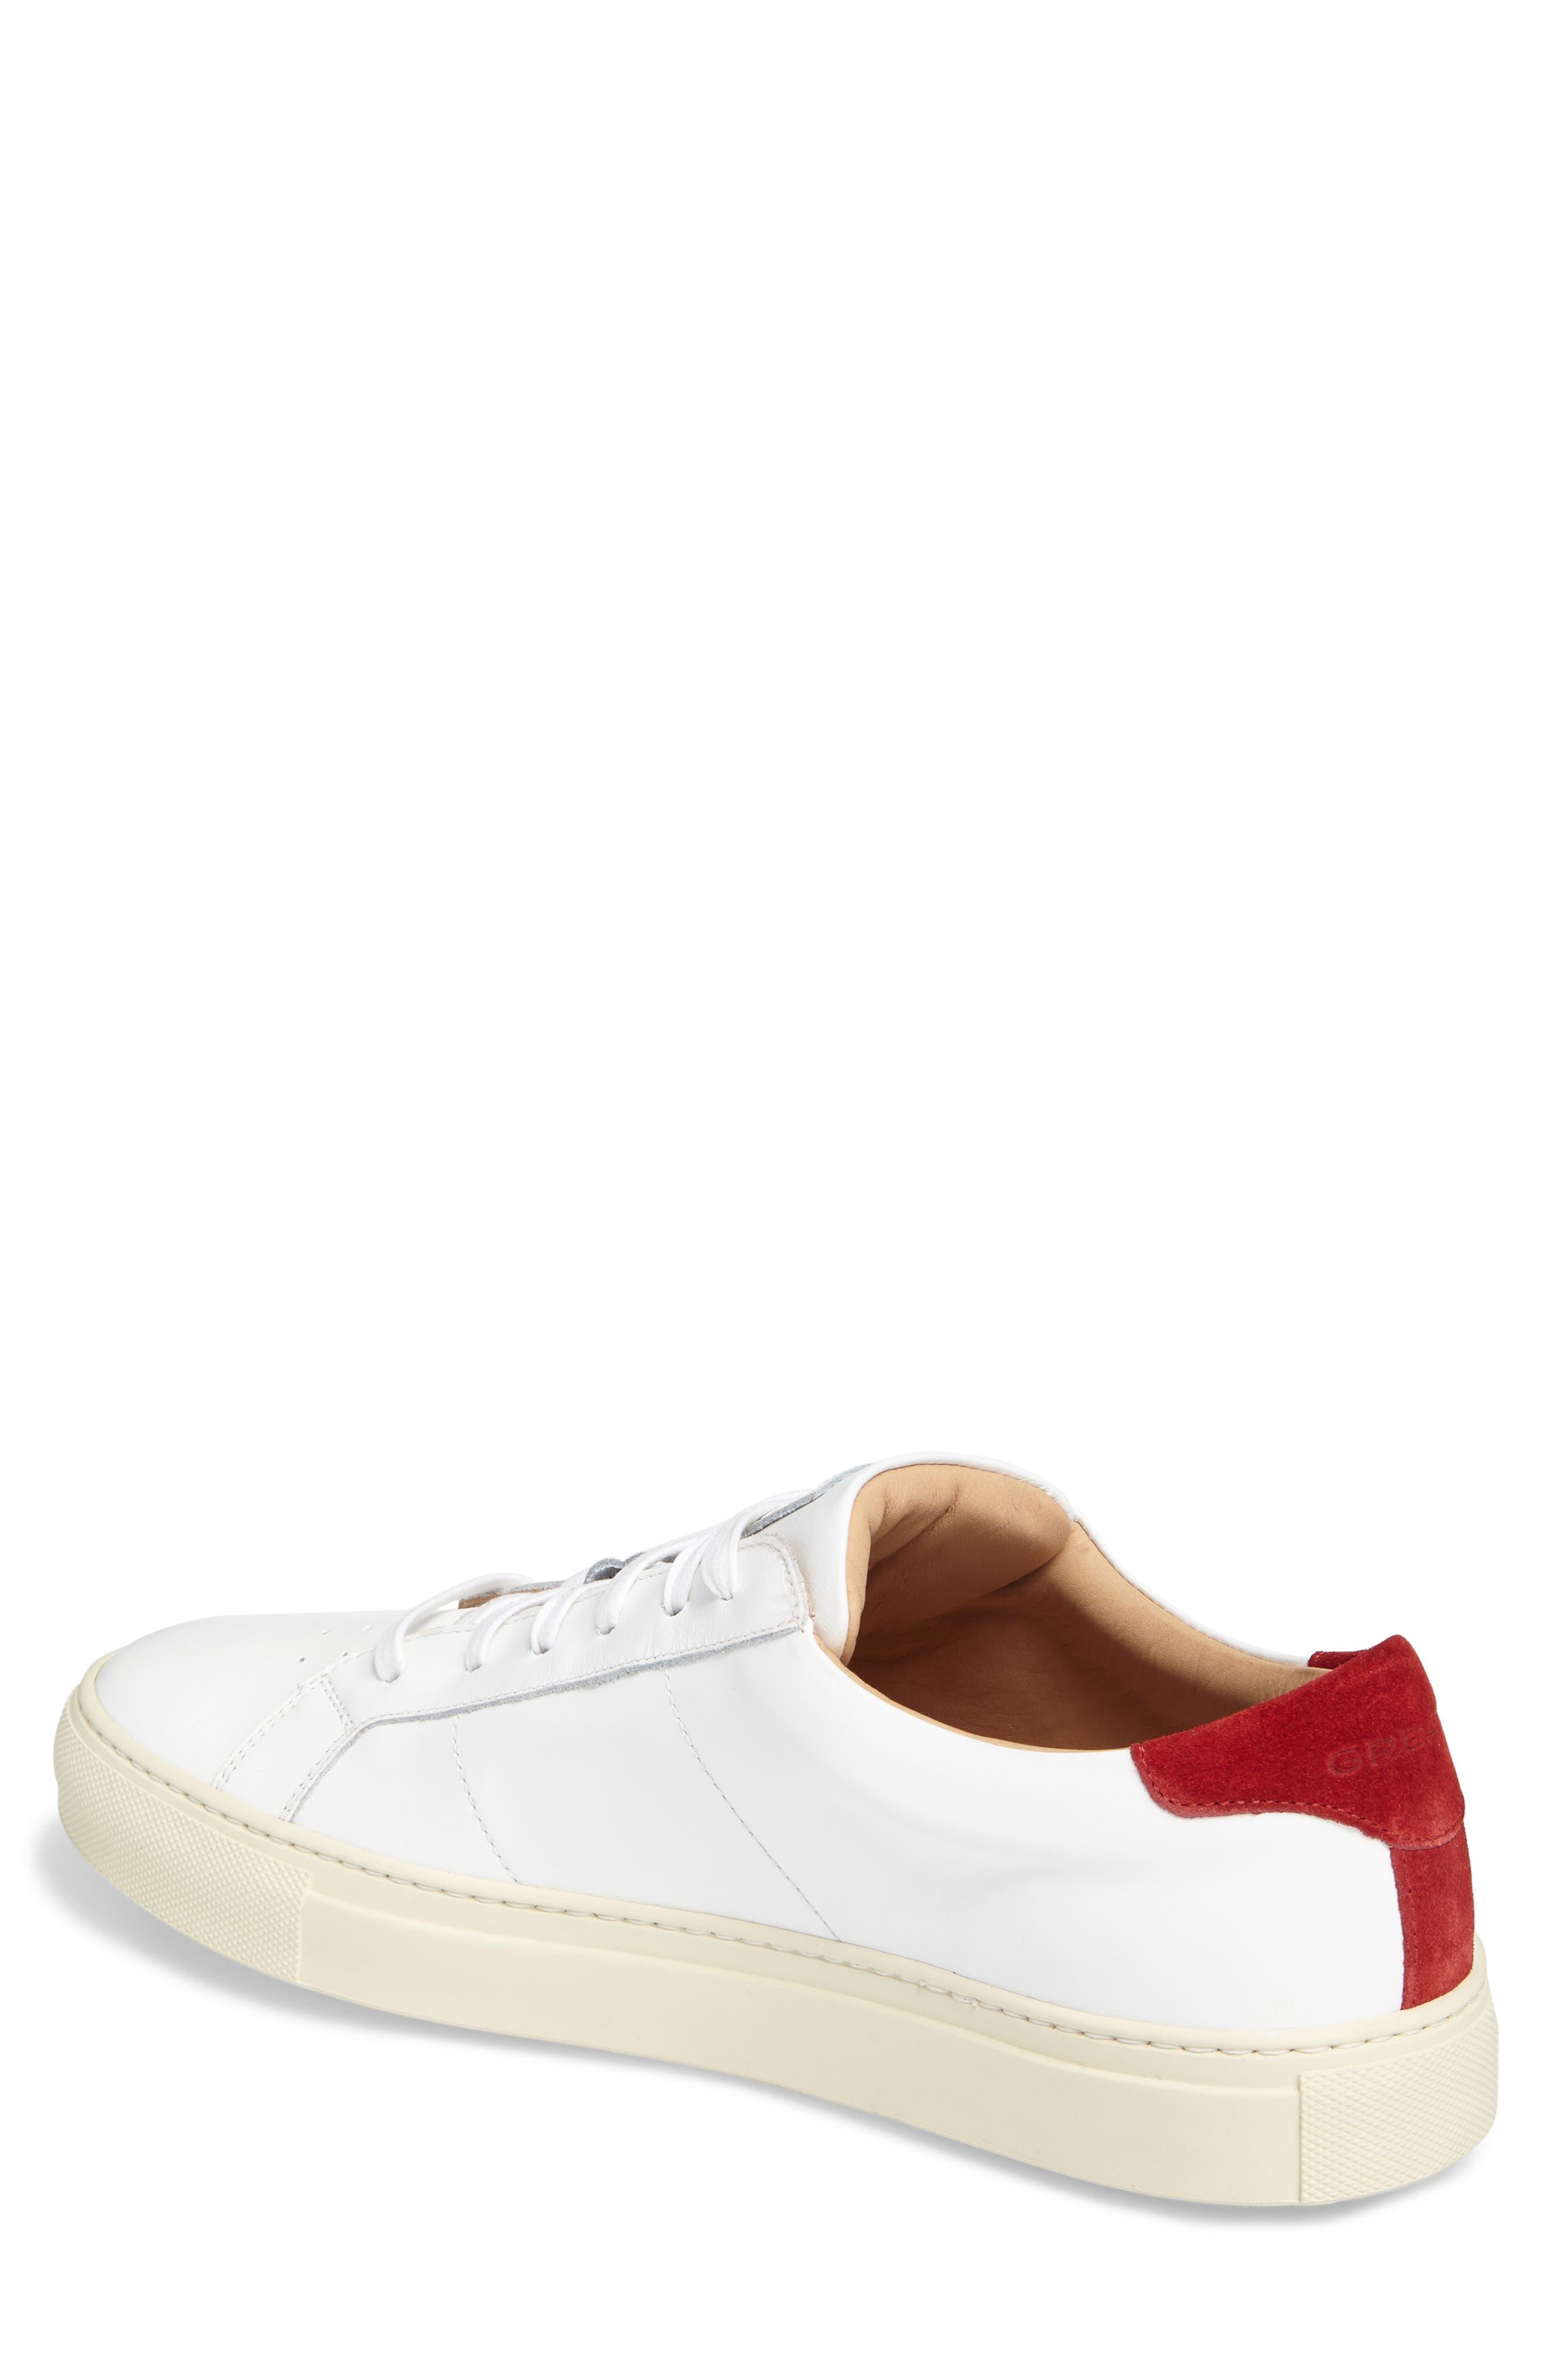 Alternate Image 2  - Greats Royale Vintage Low Top Sneaker (Men) (Nordstrom Exclusive)